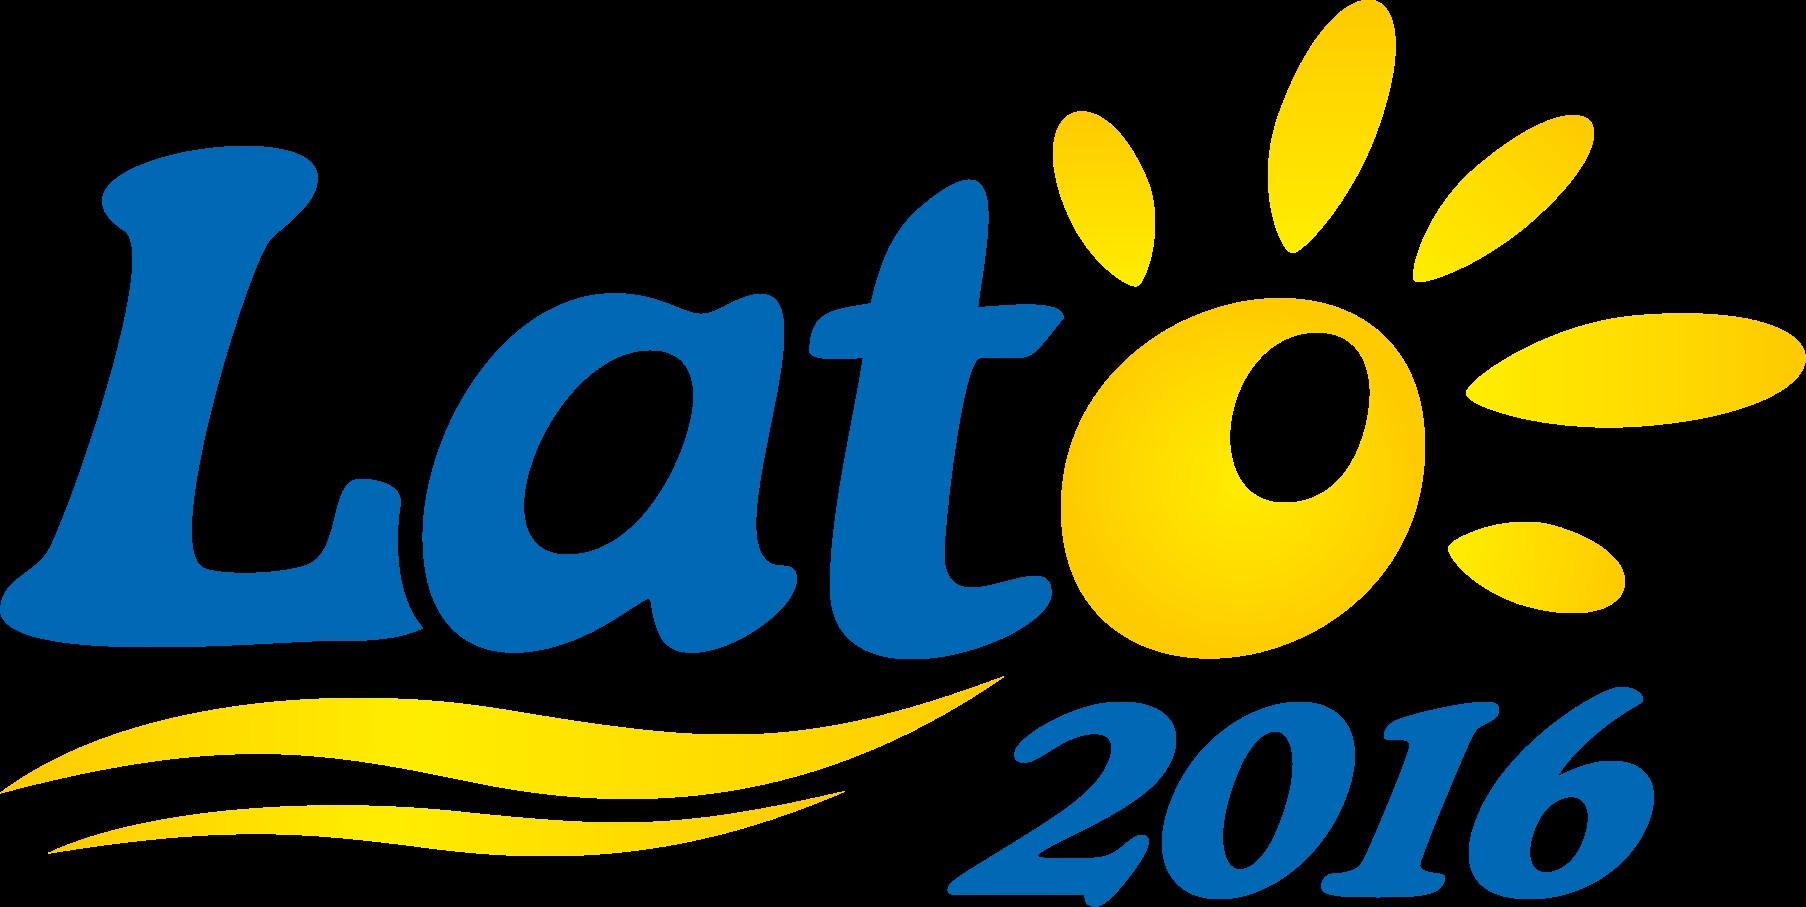 logo_Targi Lato 2016